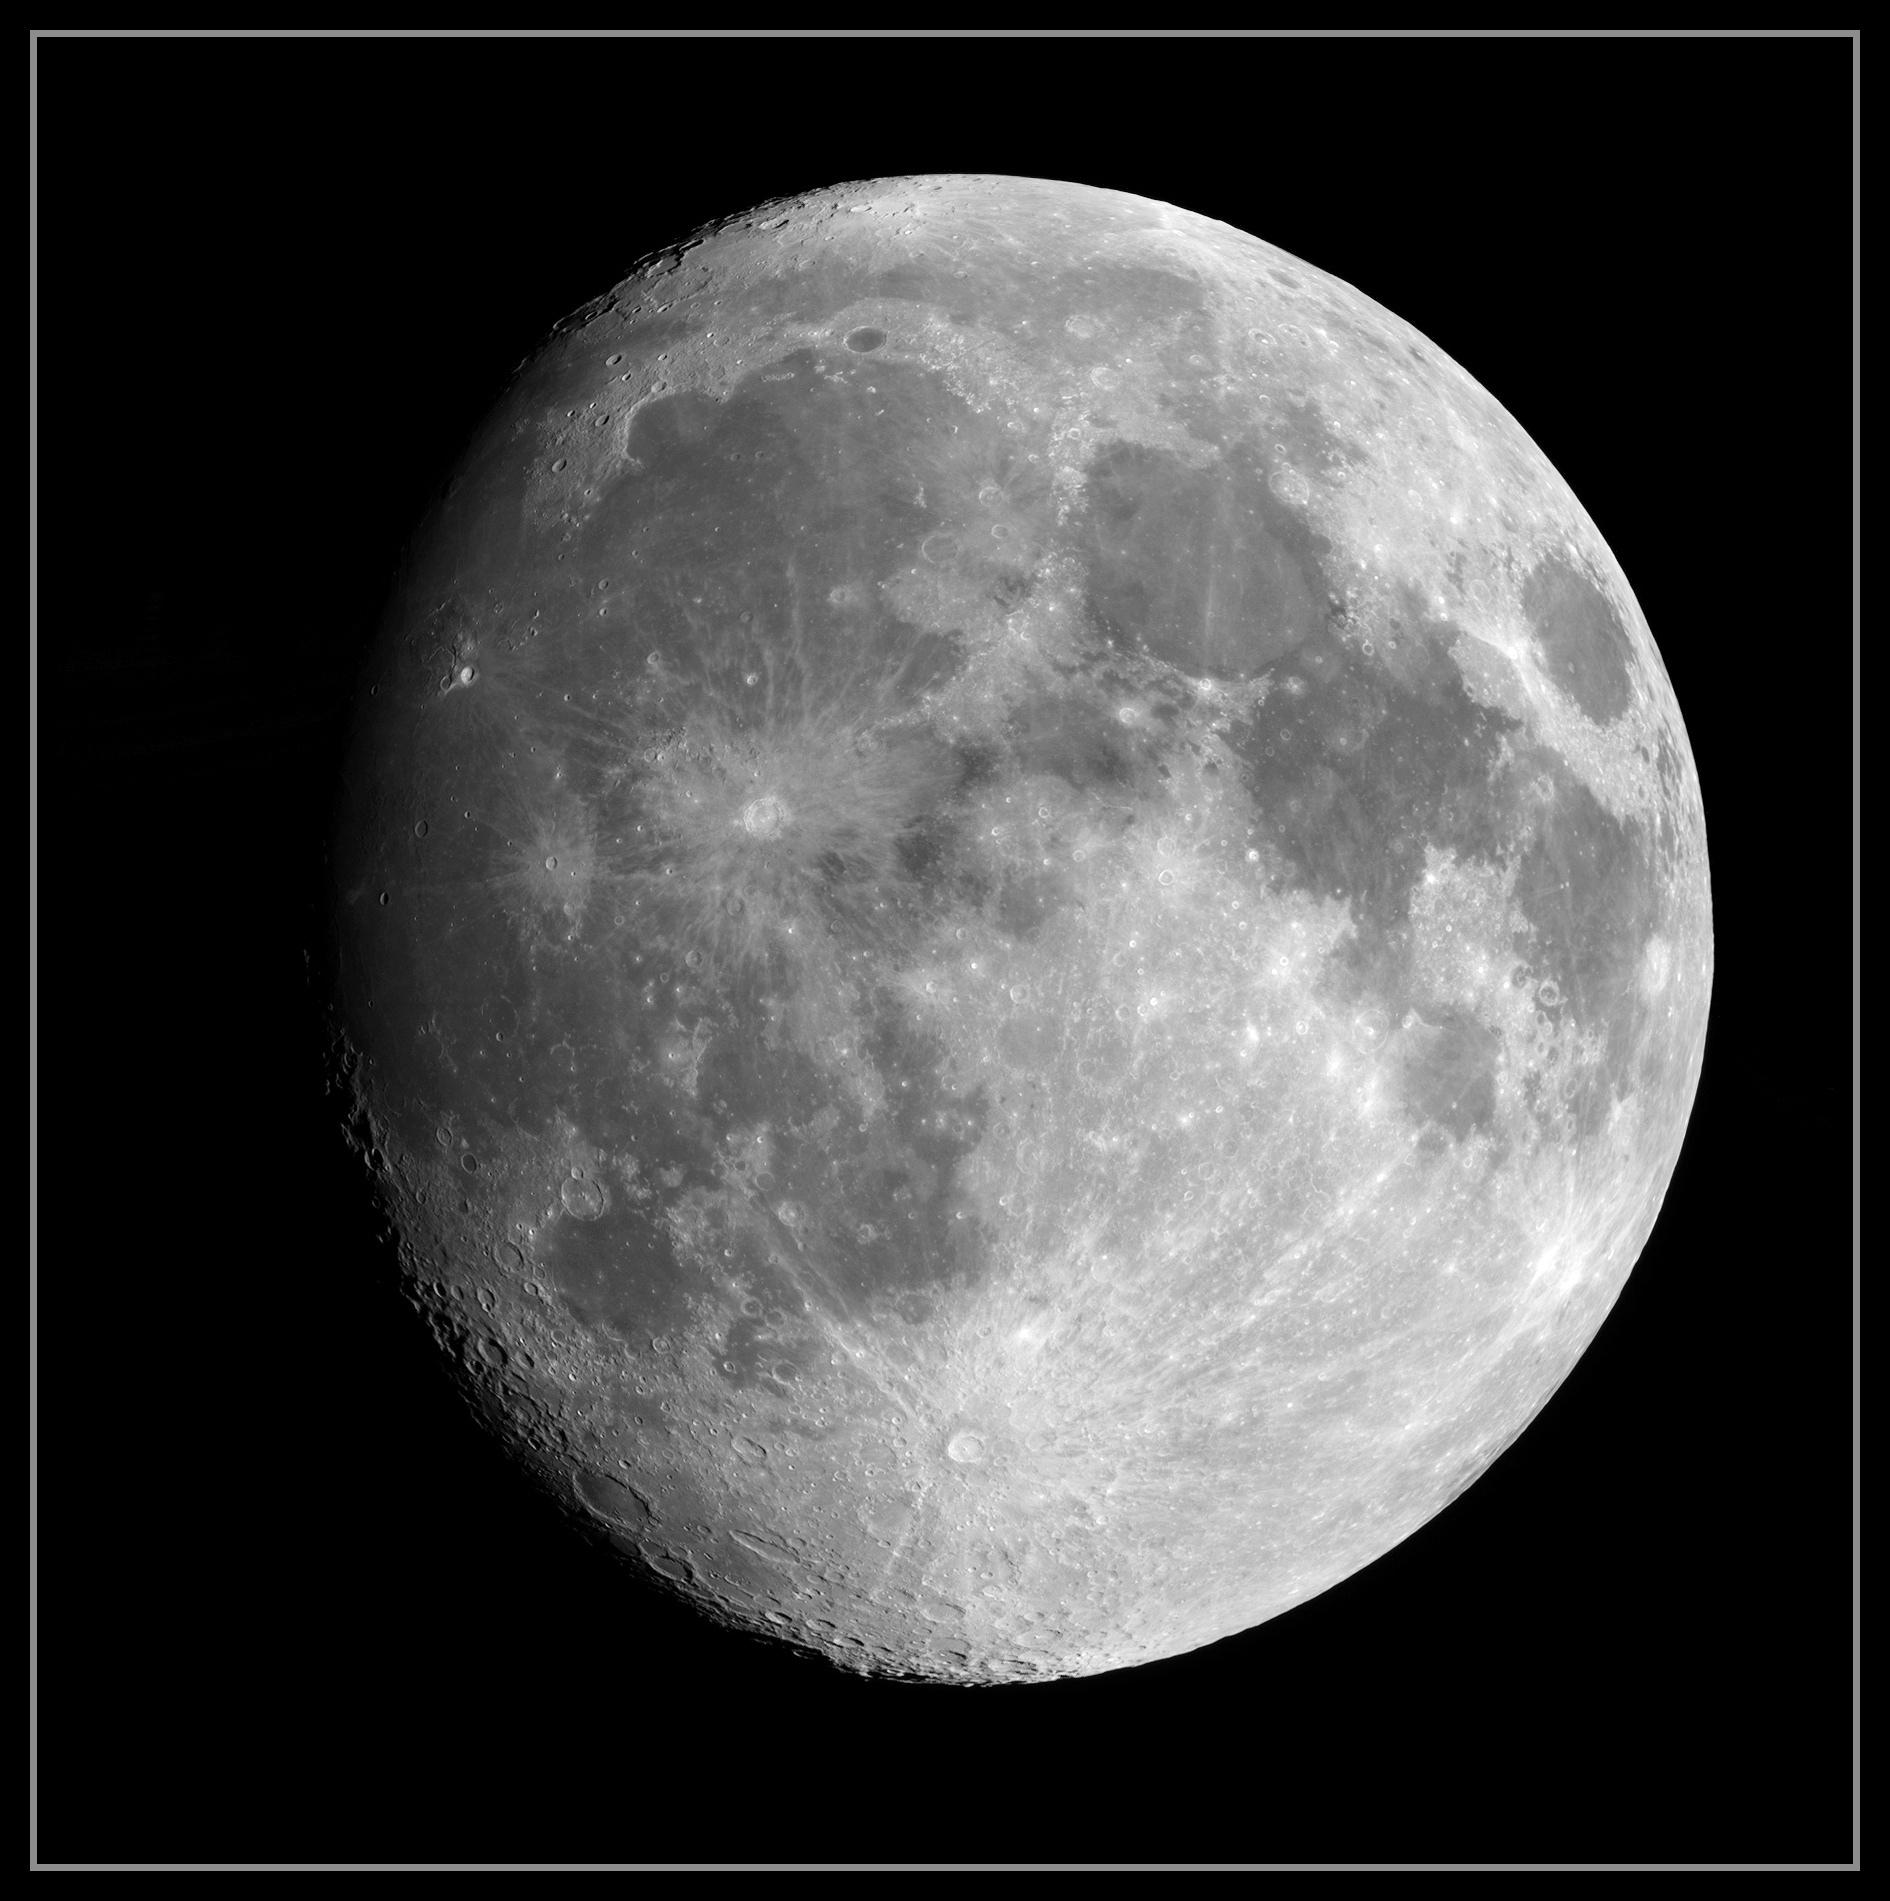 5e3ef5070f618_Moon_212734_060220_ZWOASI224MC_RGB_AS_P15_lapl3_ap942_stitchbasemono.jpg.4dda1398c57c426cc66ff38f39f780c6.jpg